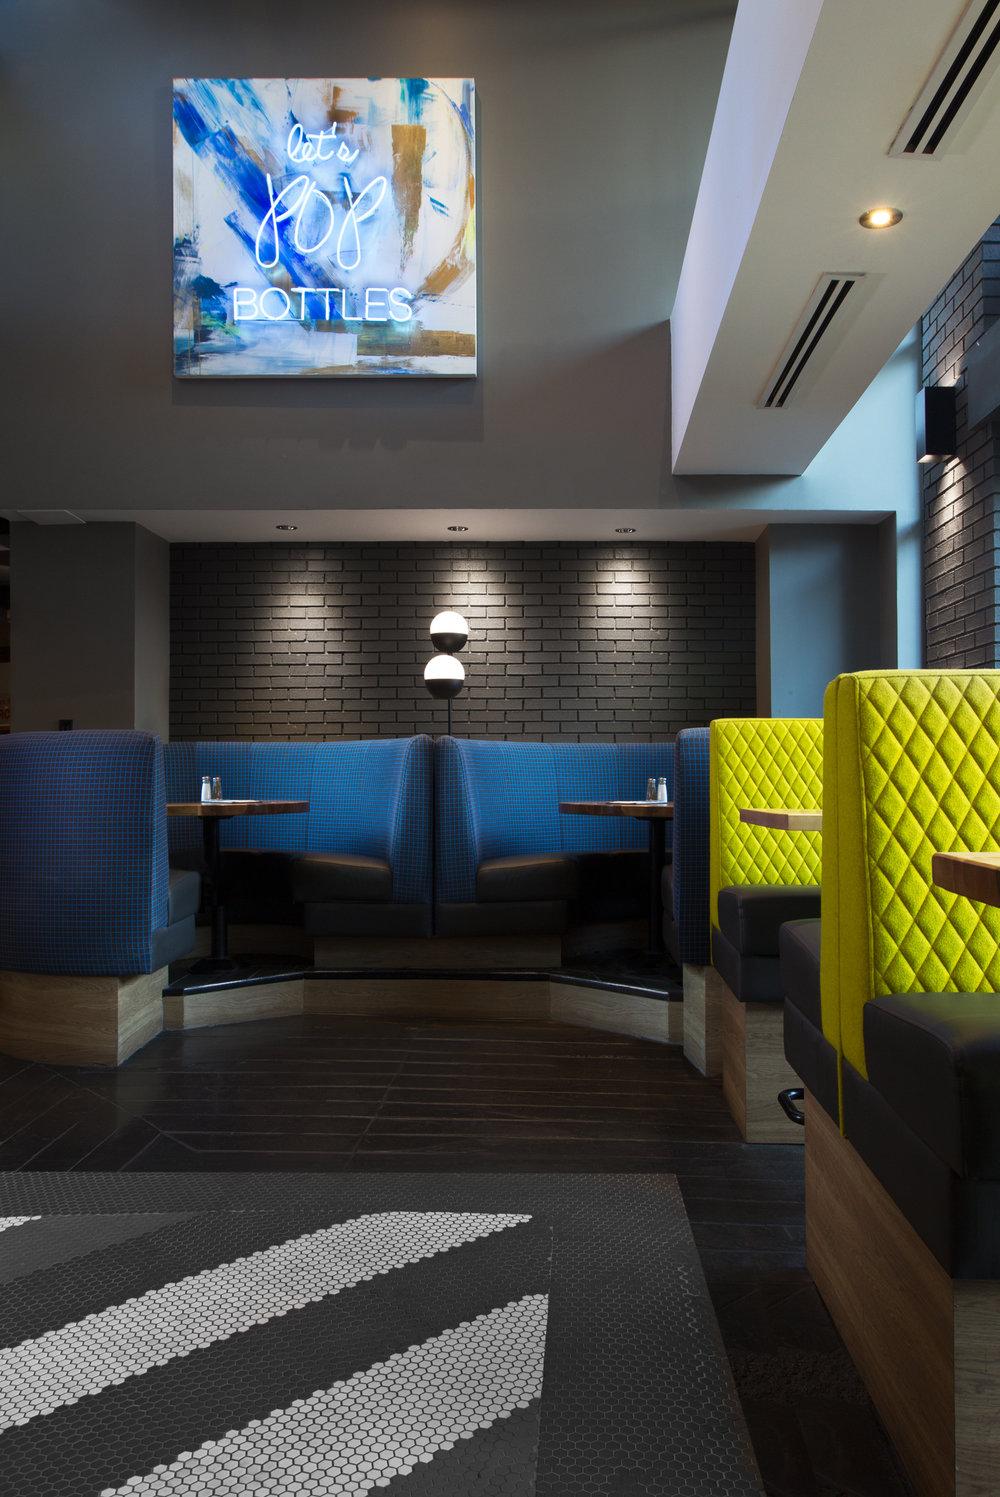 Moxie's Grill & Bar by Daniel Meloché Interior Design